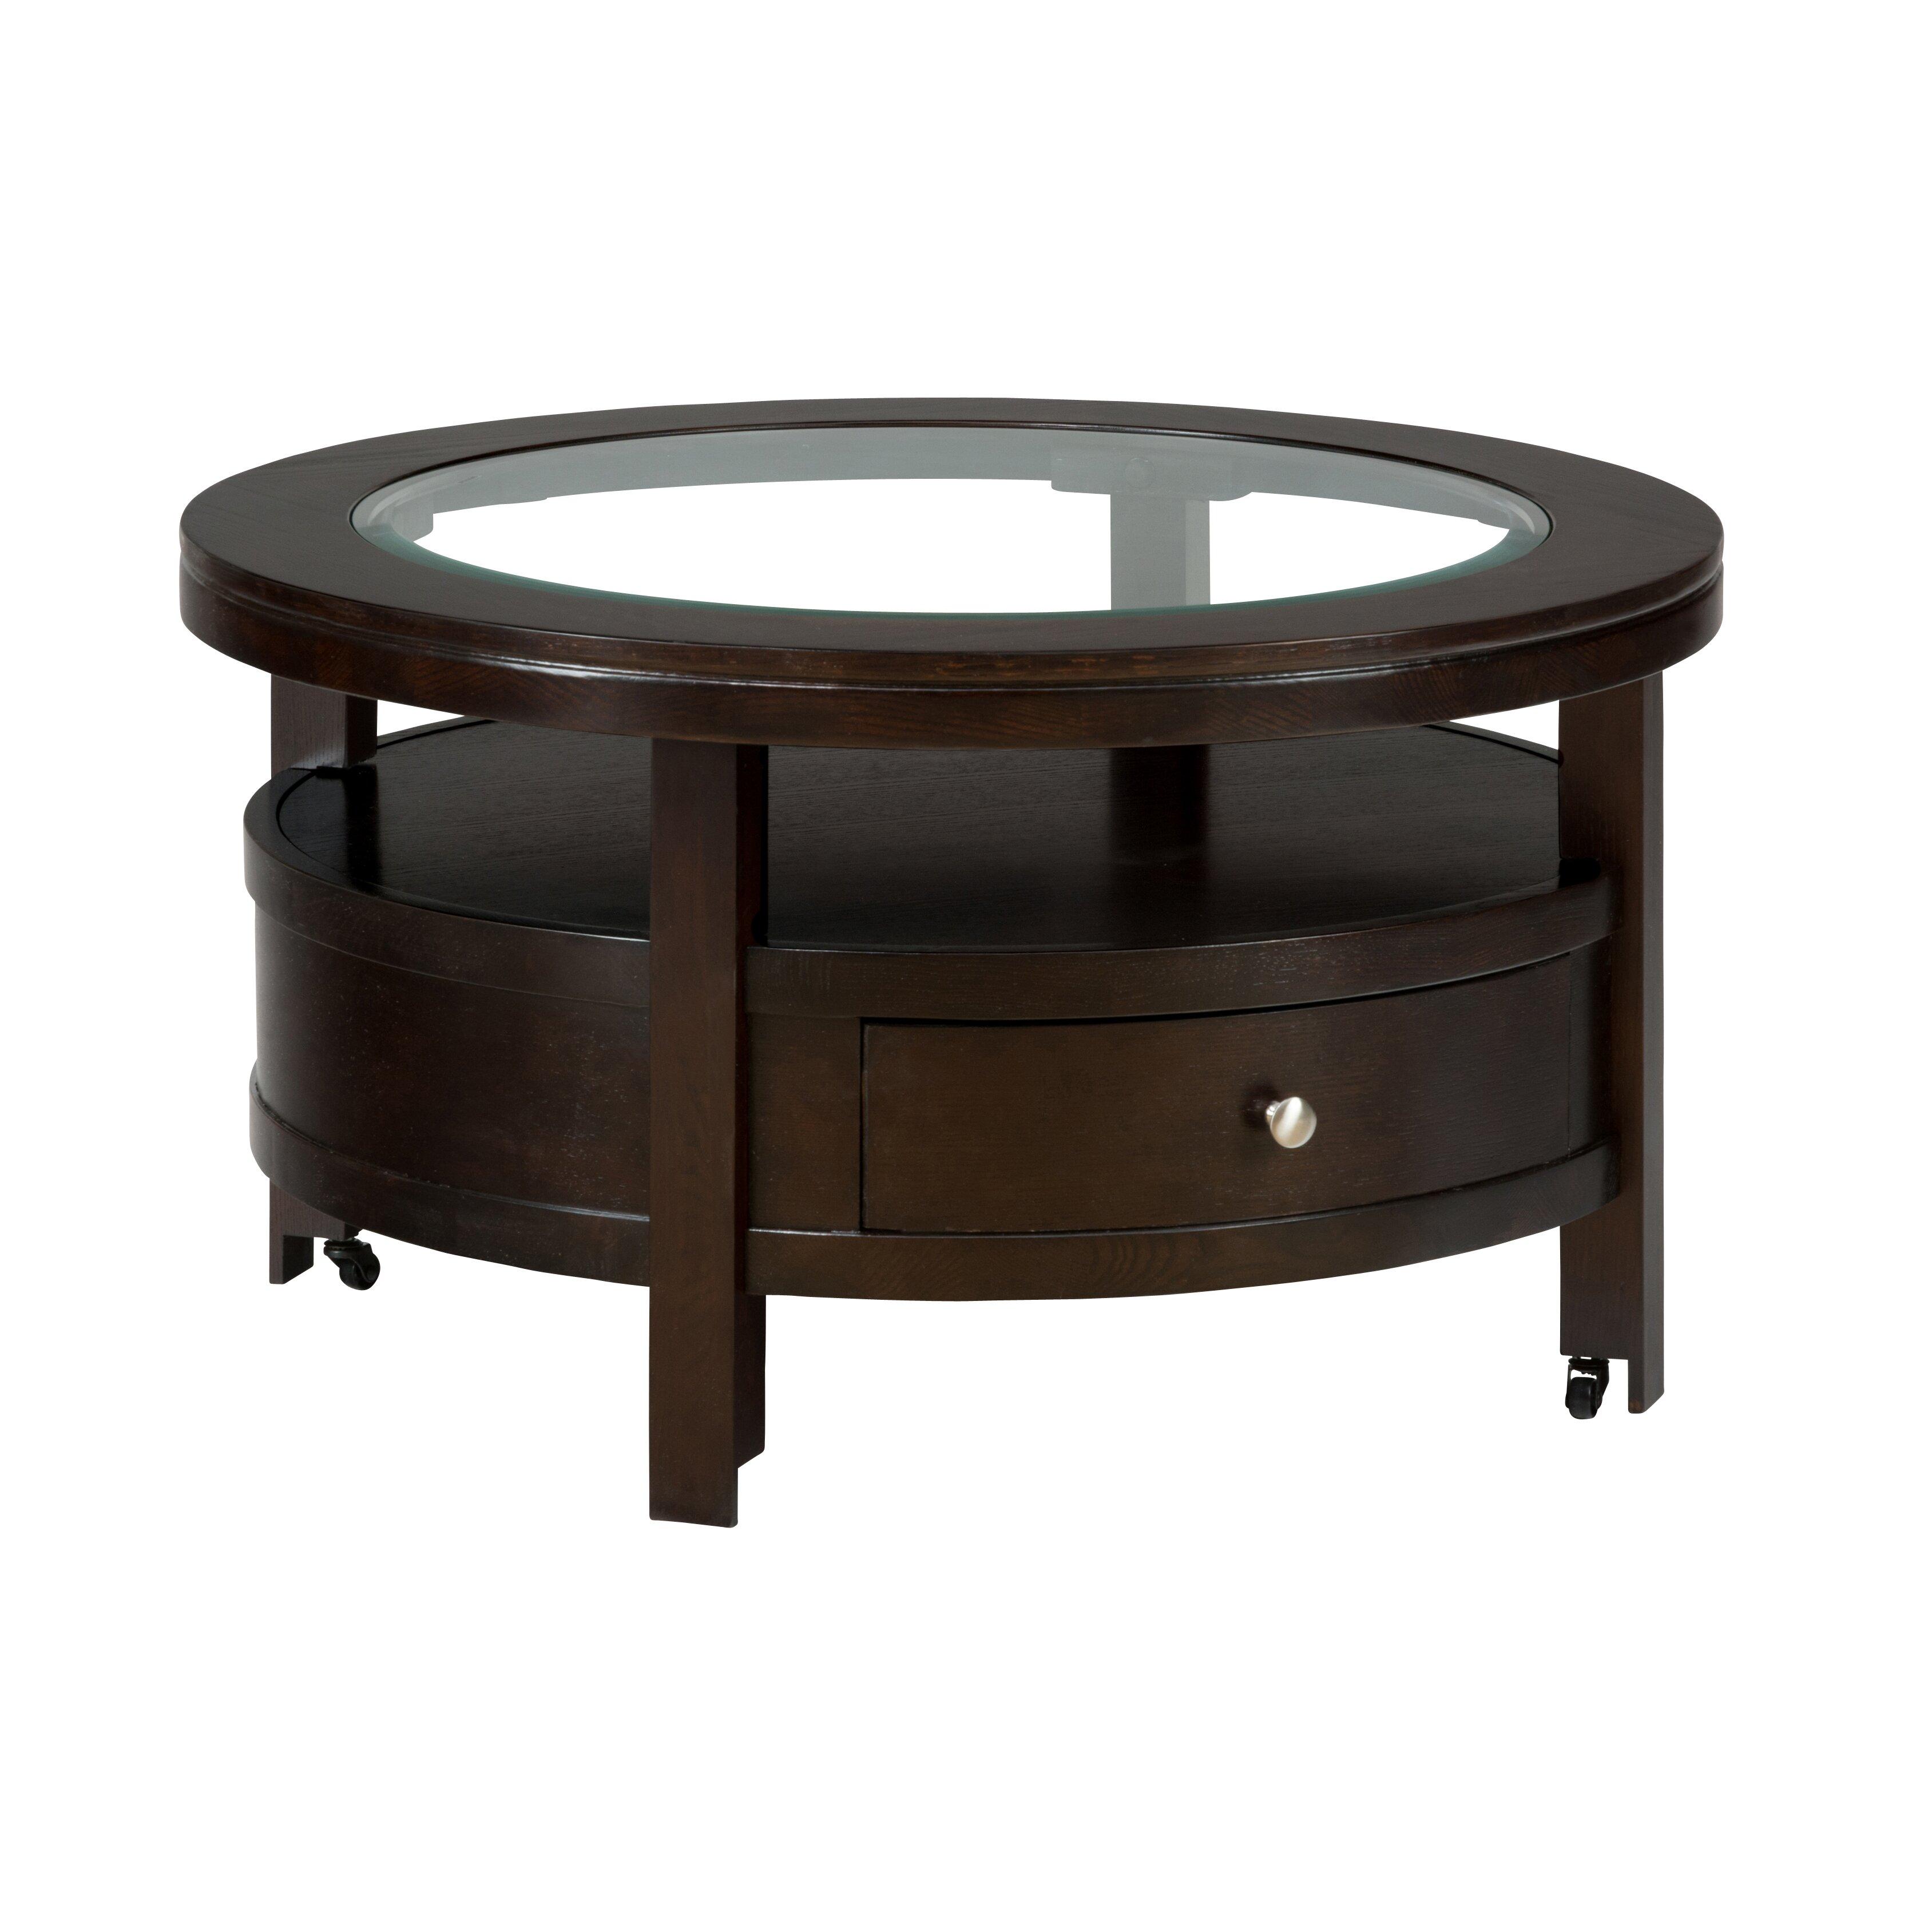 jofran marlon round coffee table reviews wayfair. Black Bedroom Furniture Sets. Home Design Ideas